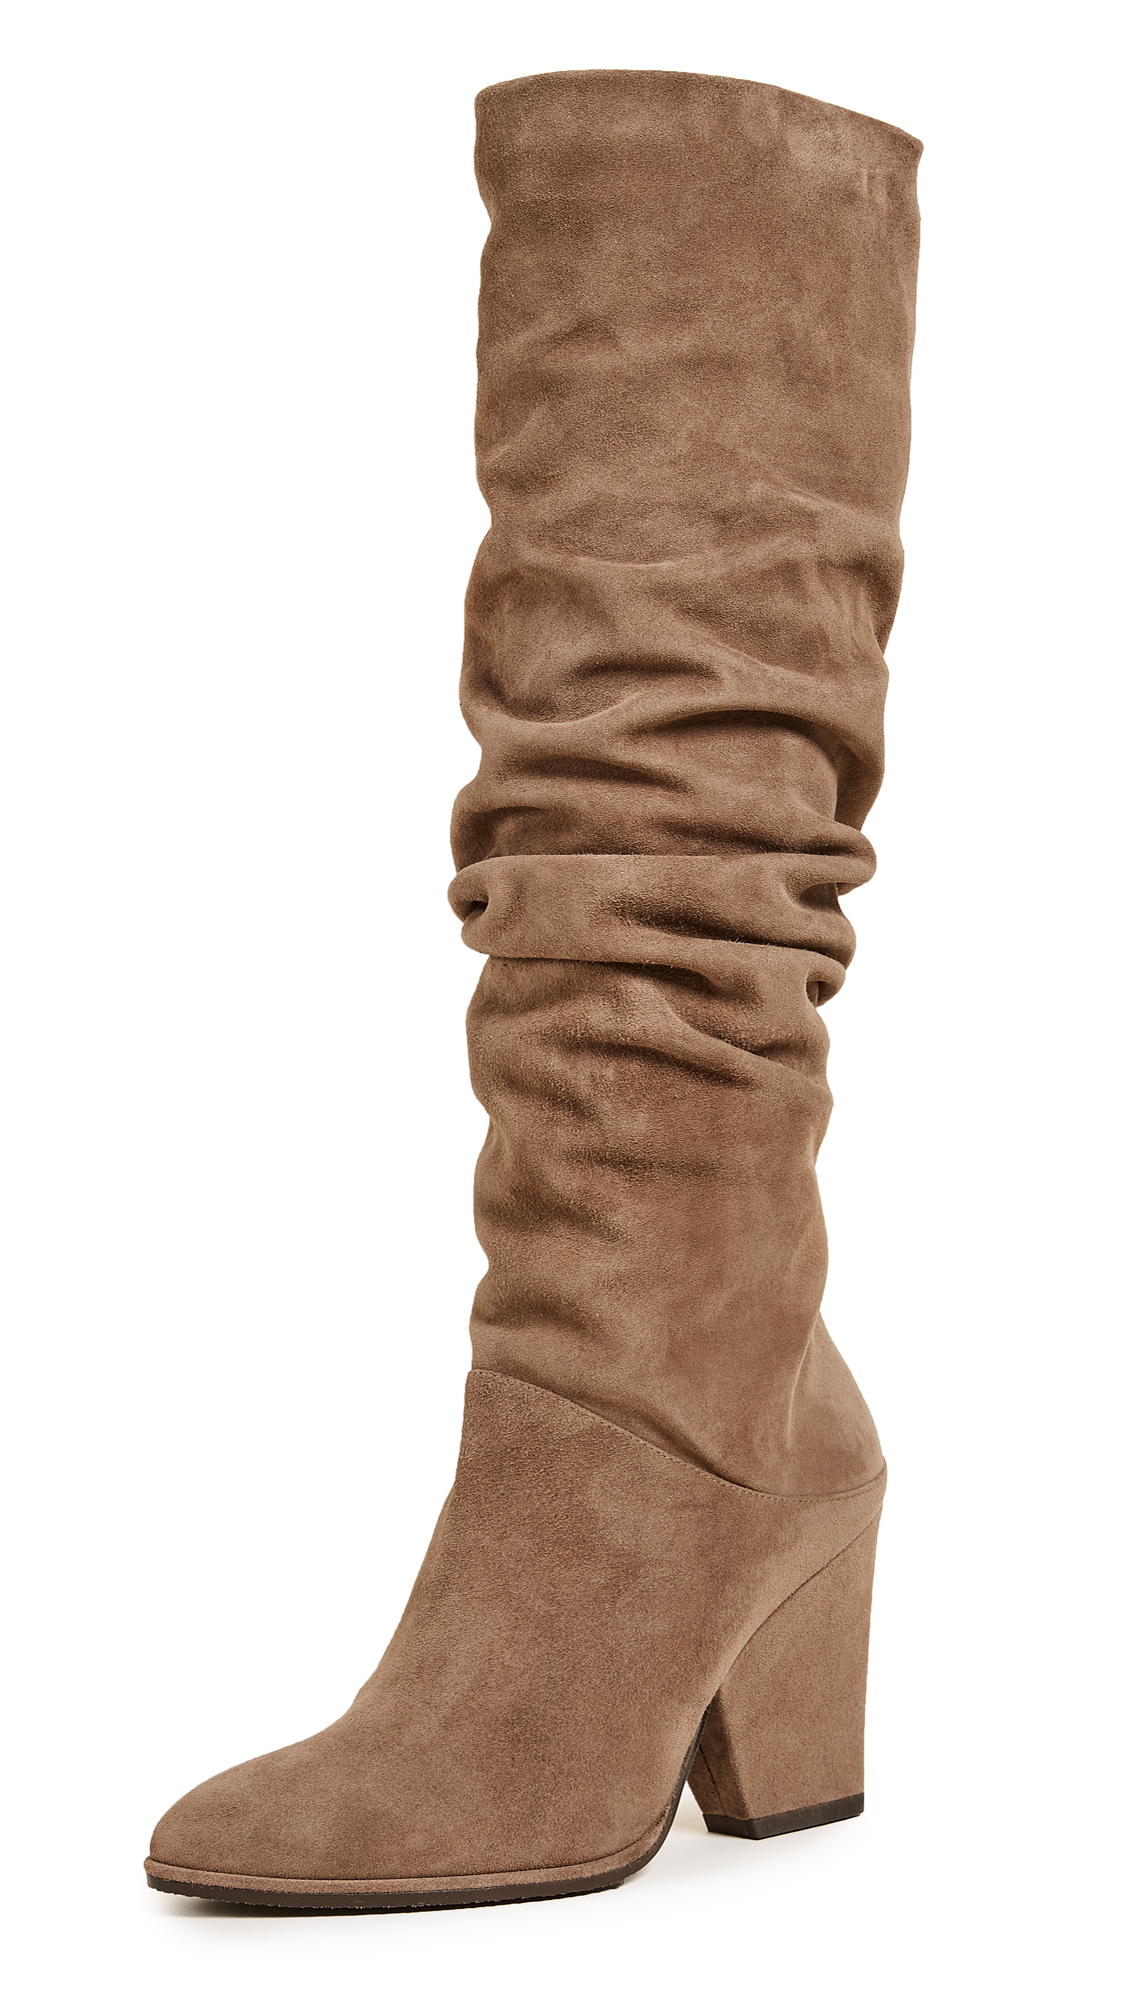 Stuart Weitzman Smashing Knee High Boots - Nutmeg